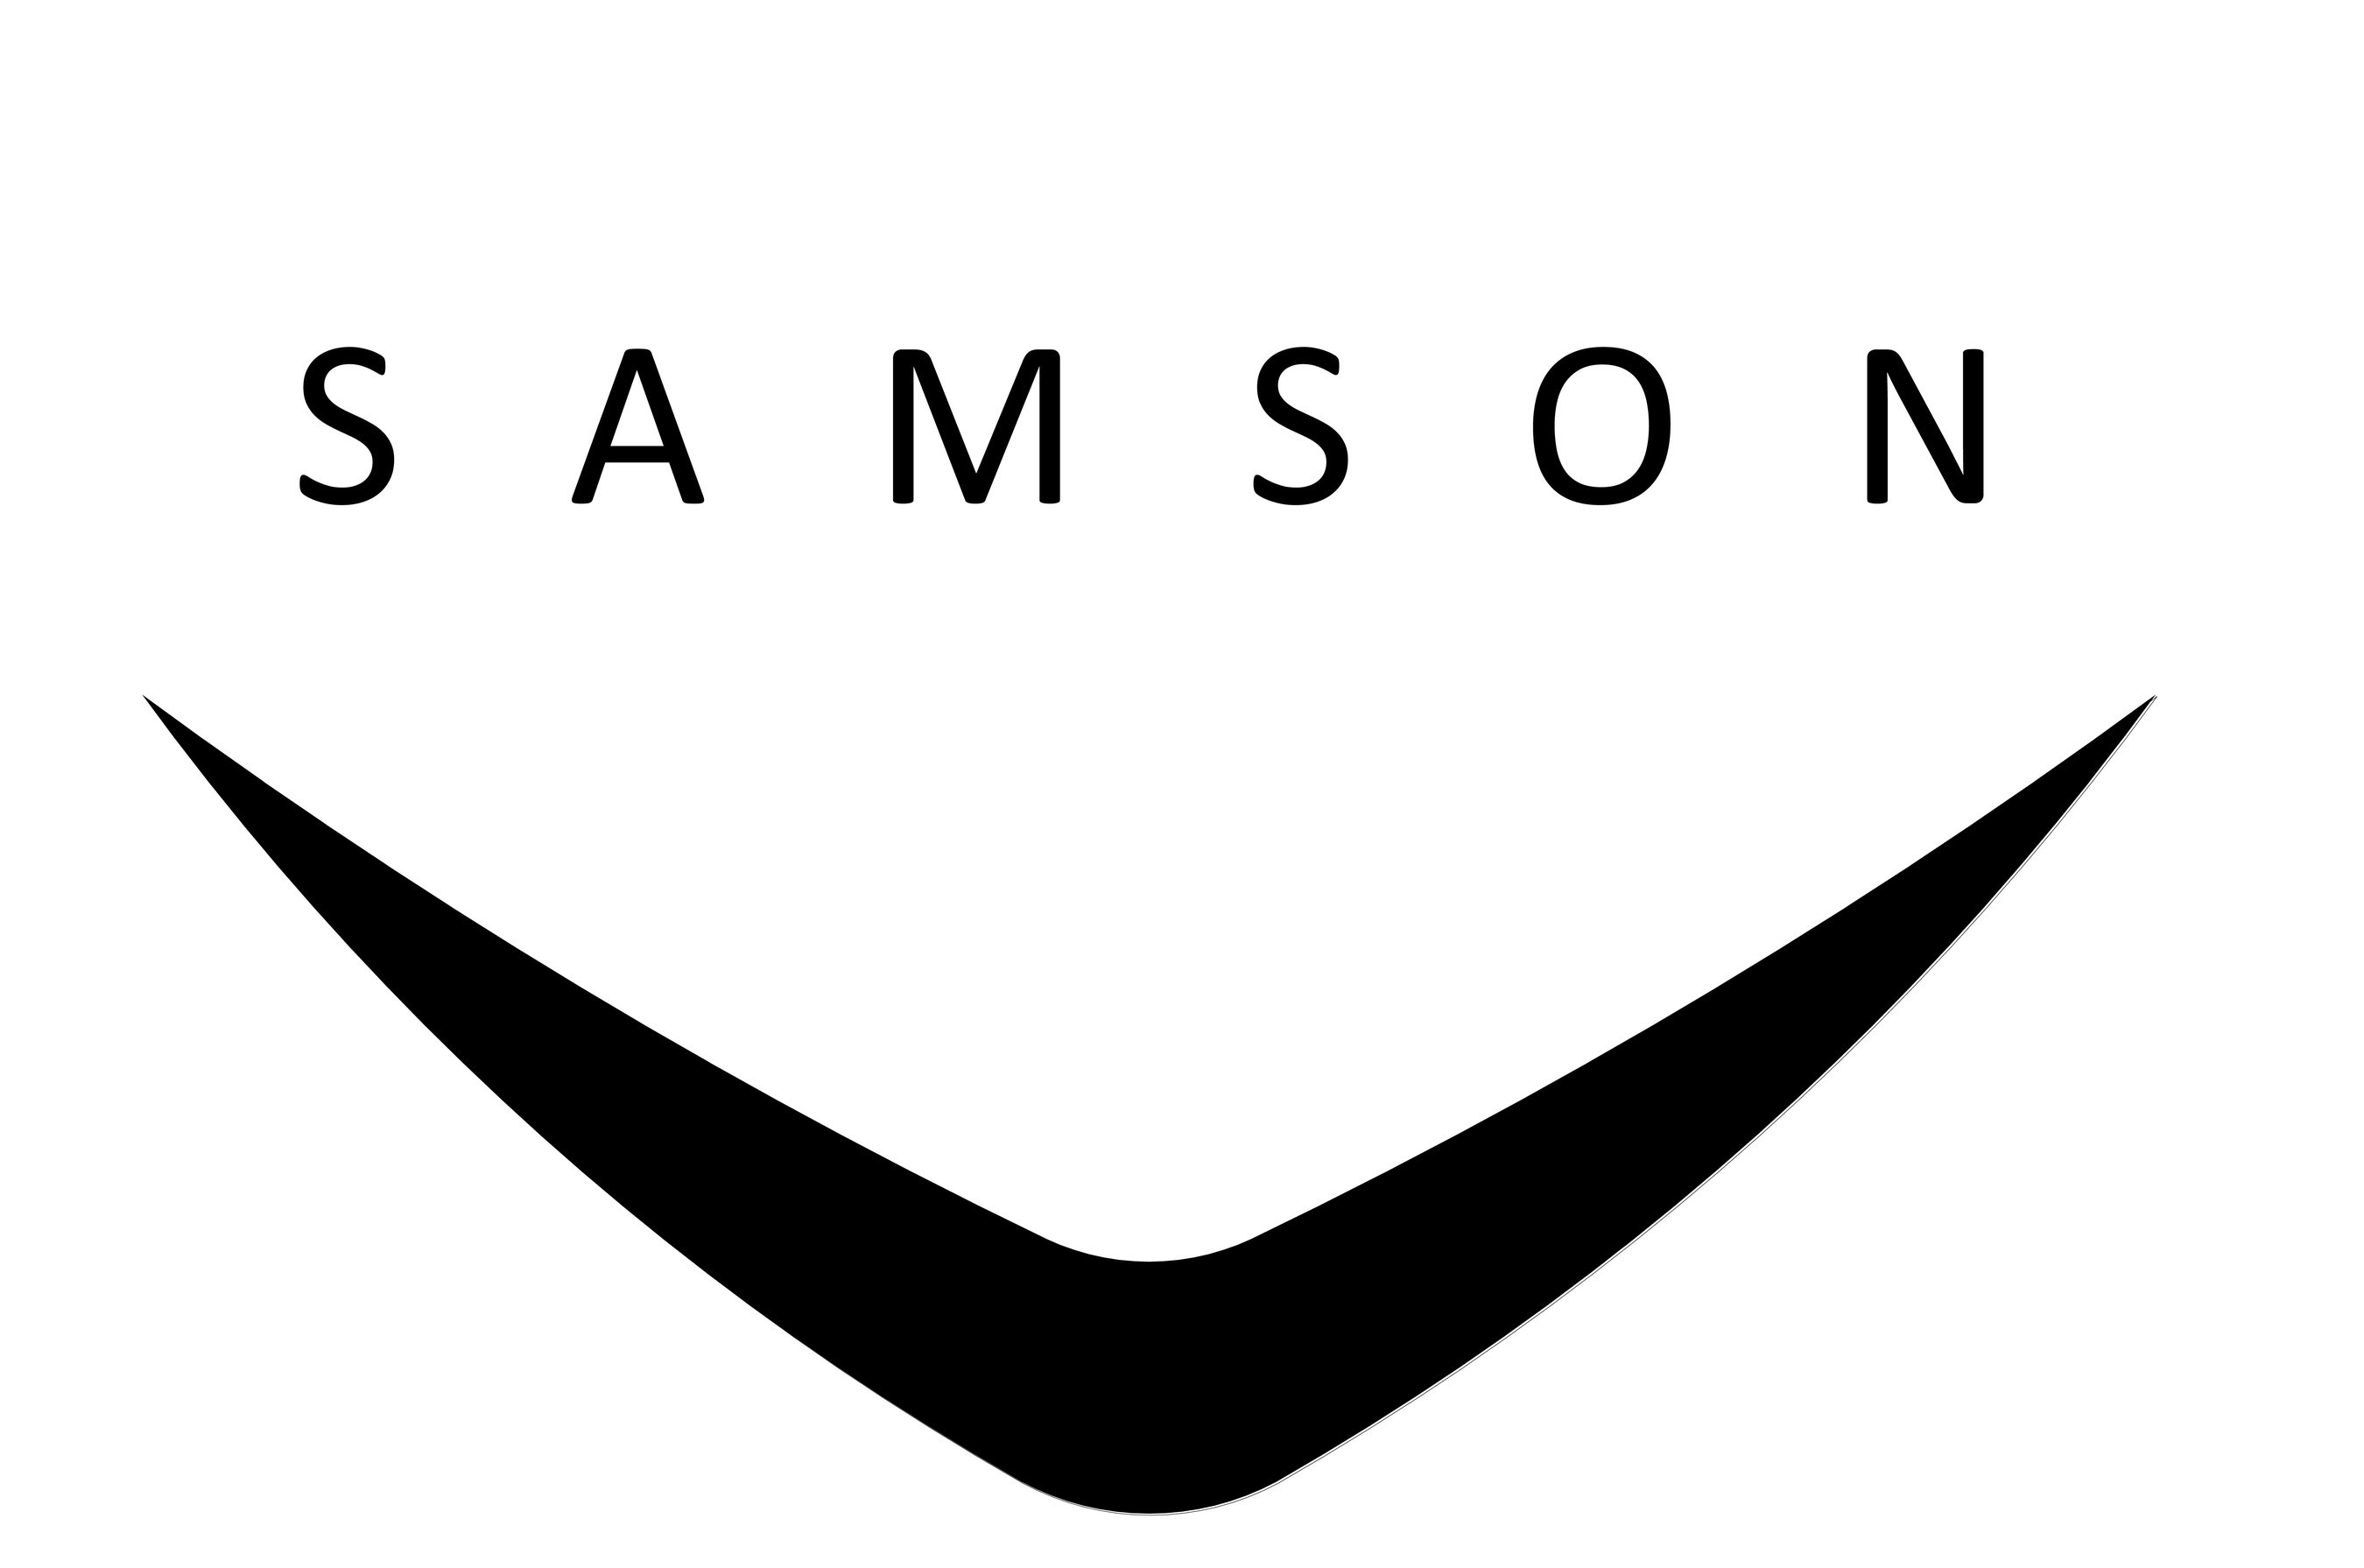 Samson Motorworks, creators of the Switchblade flying sports car.